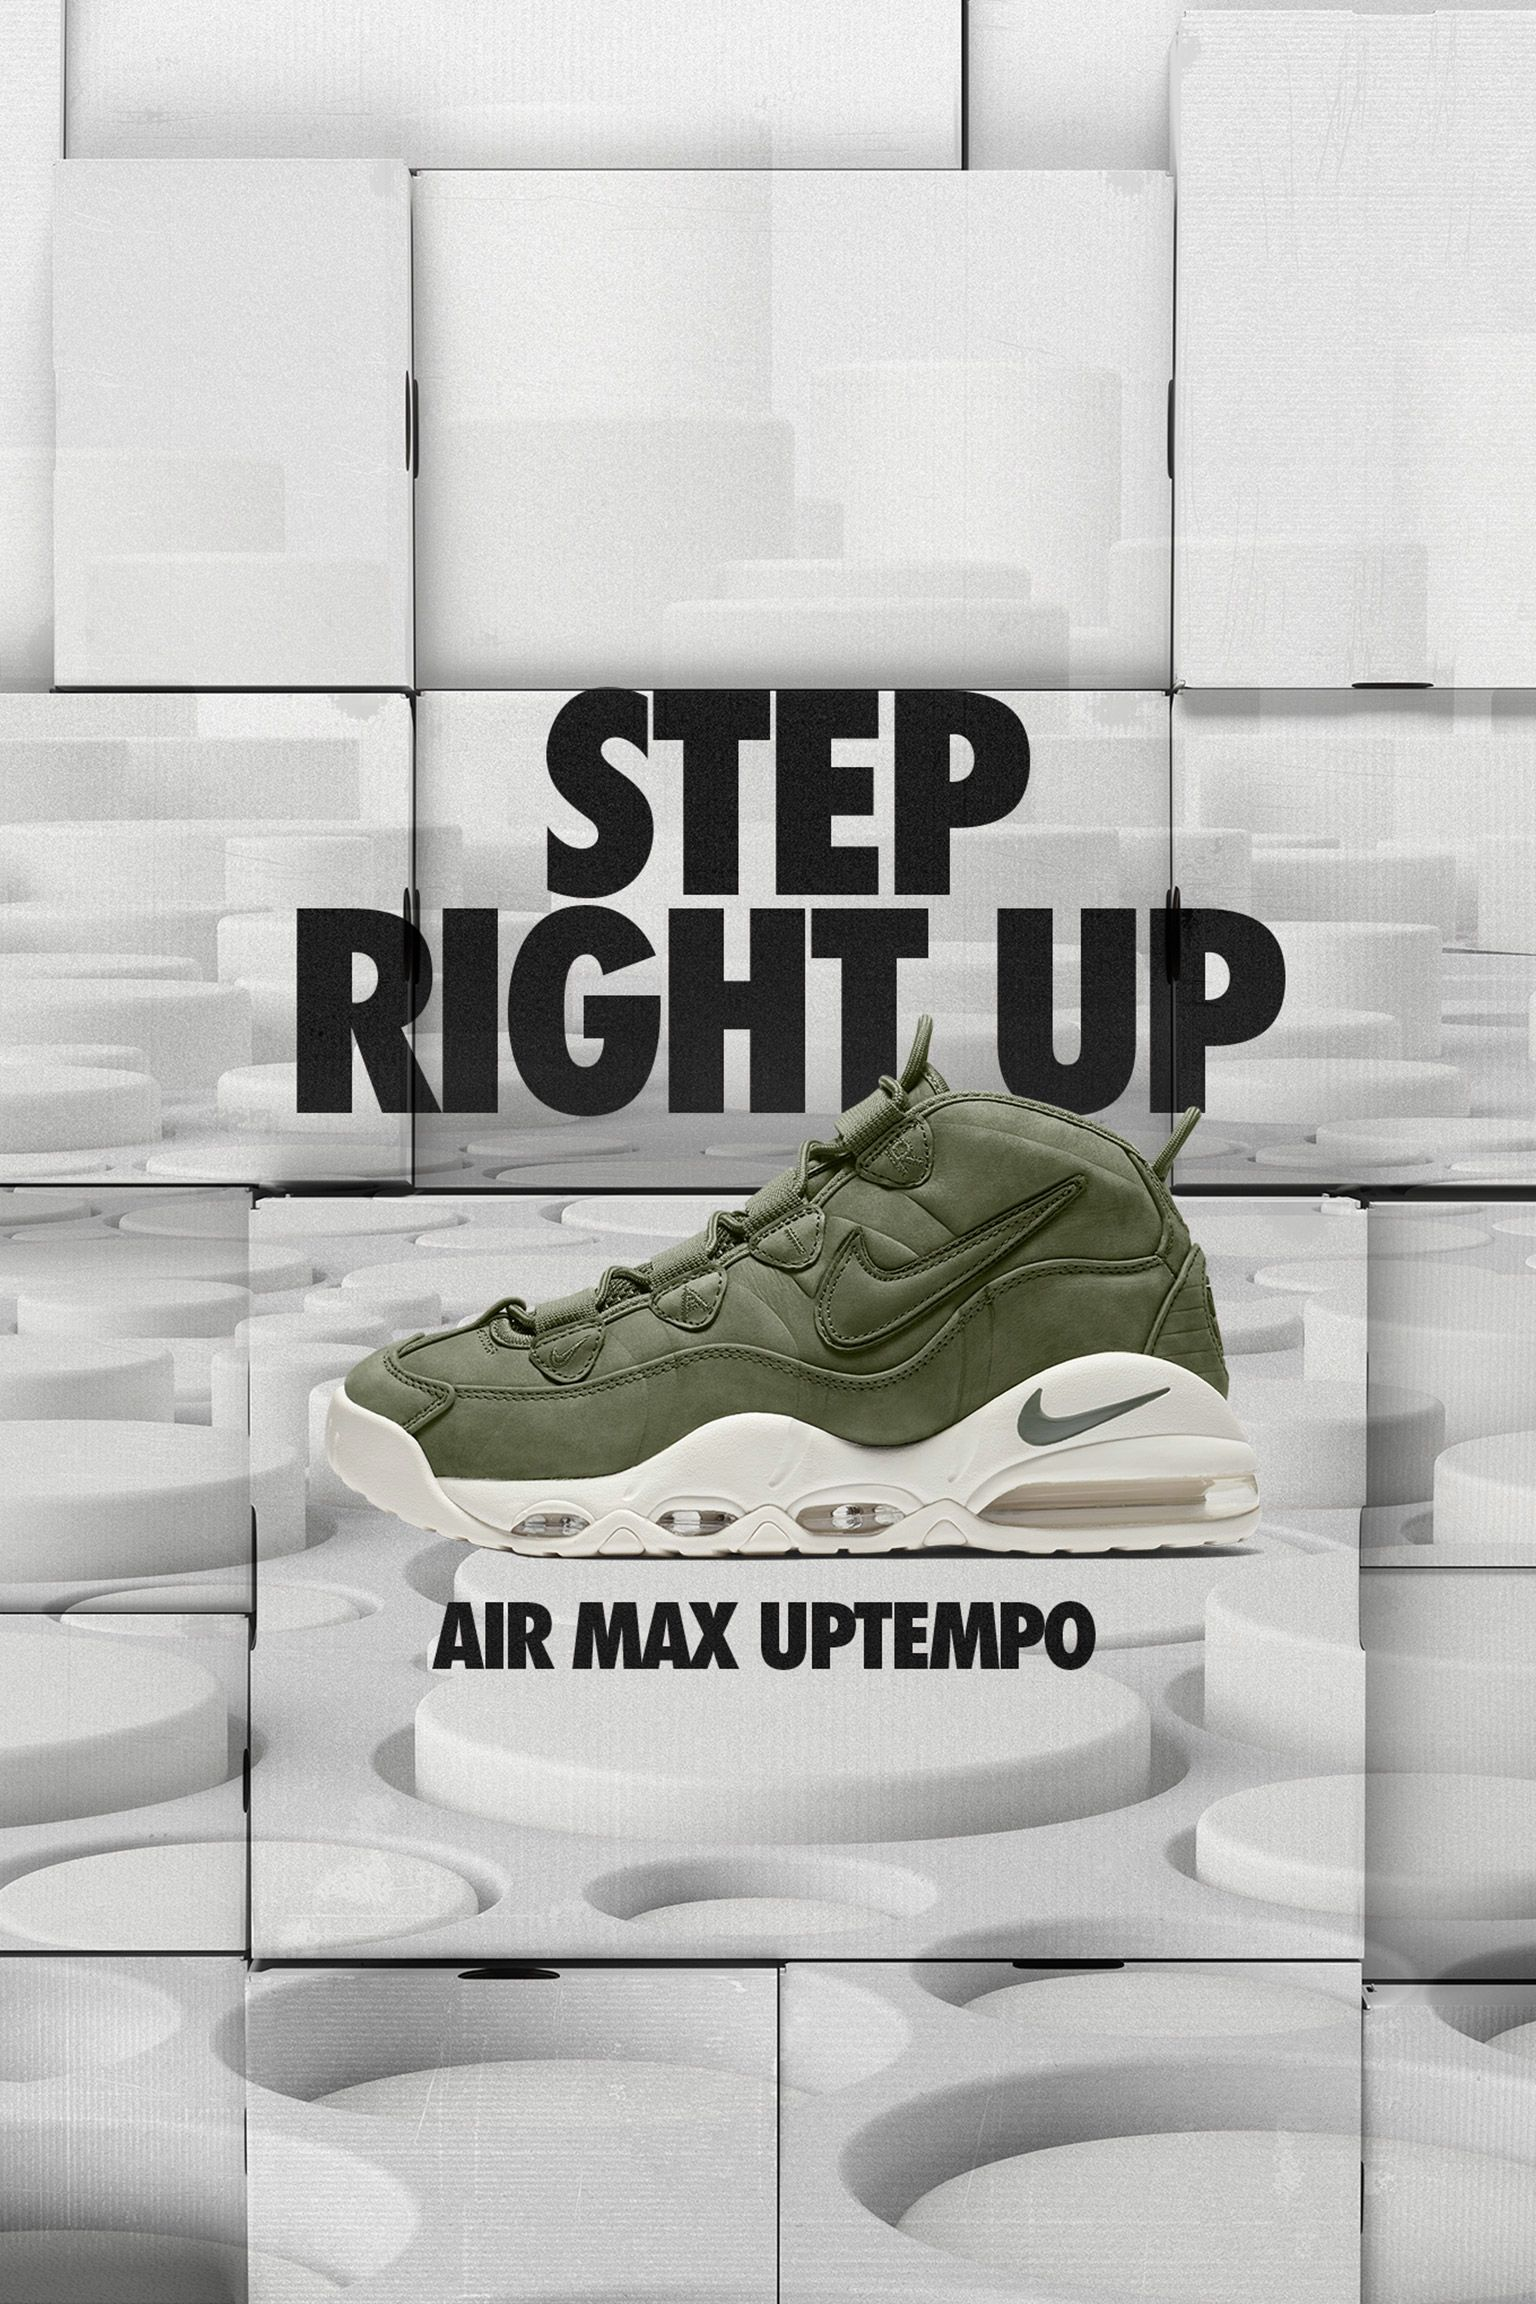 AIR MAX UPTEMPO